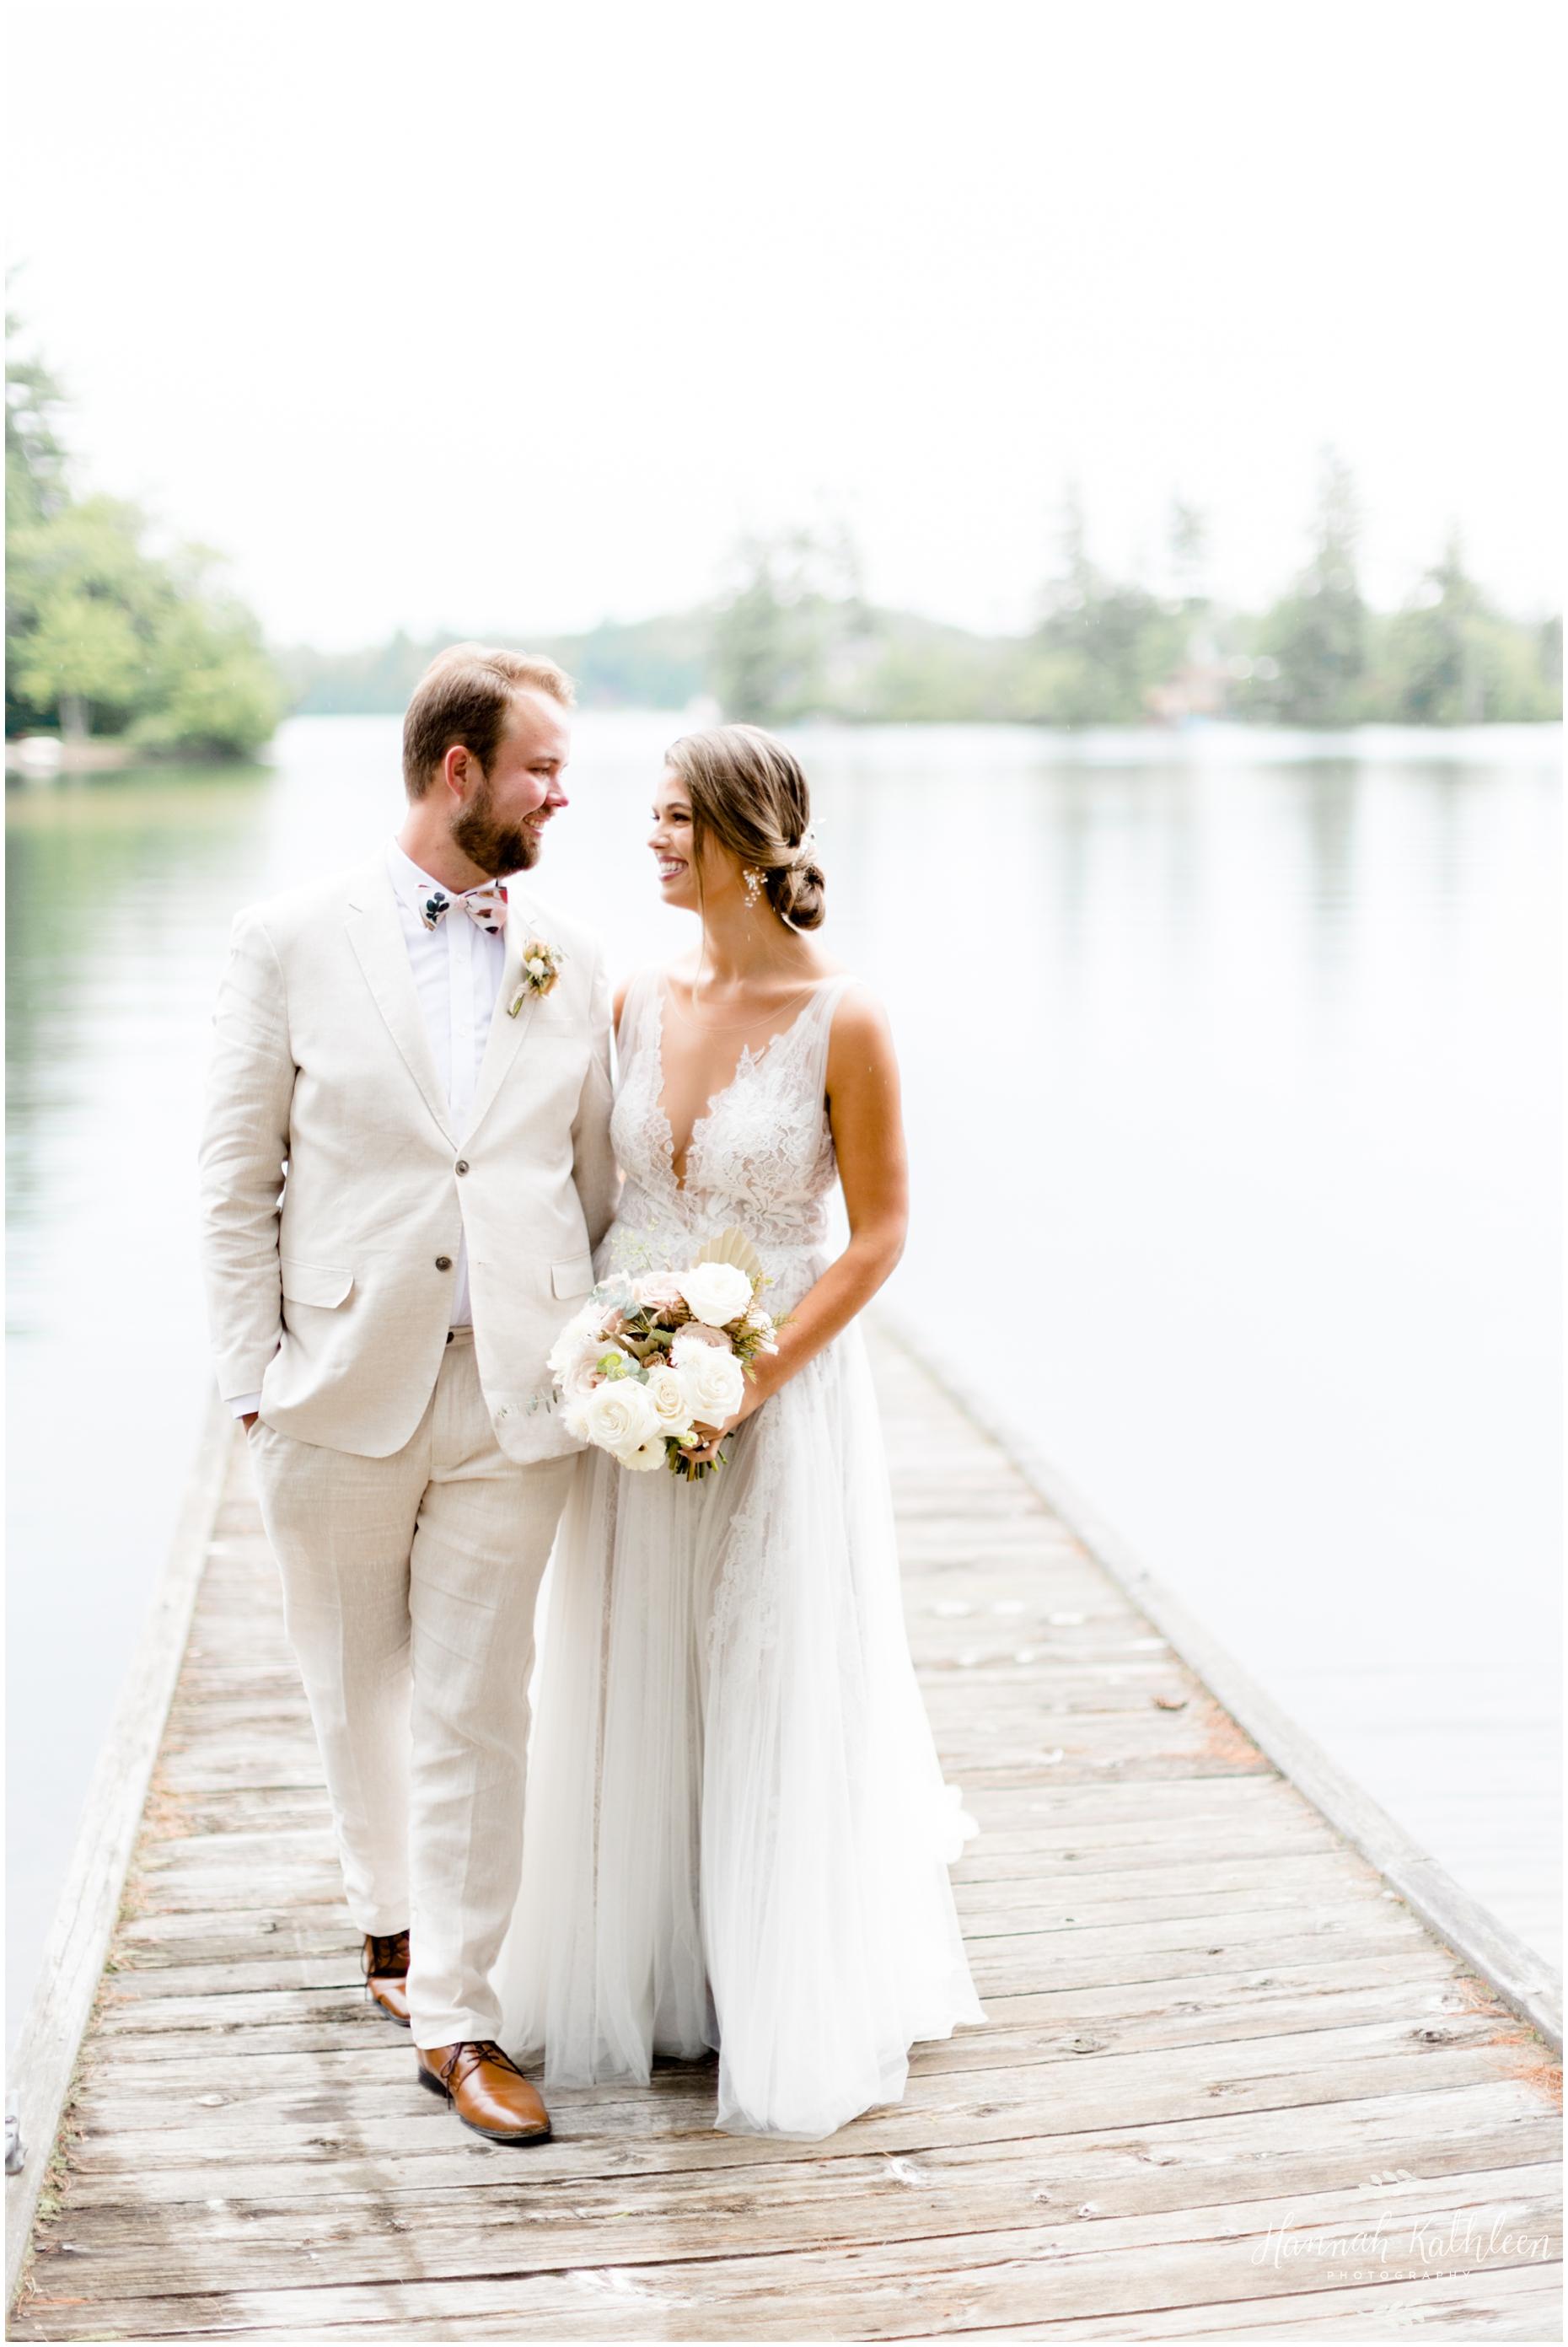 adirondacks-elopement-small-wedding-intimate-backyard-new-york-photography-lake-mountains-outdoor